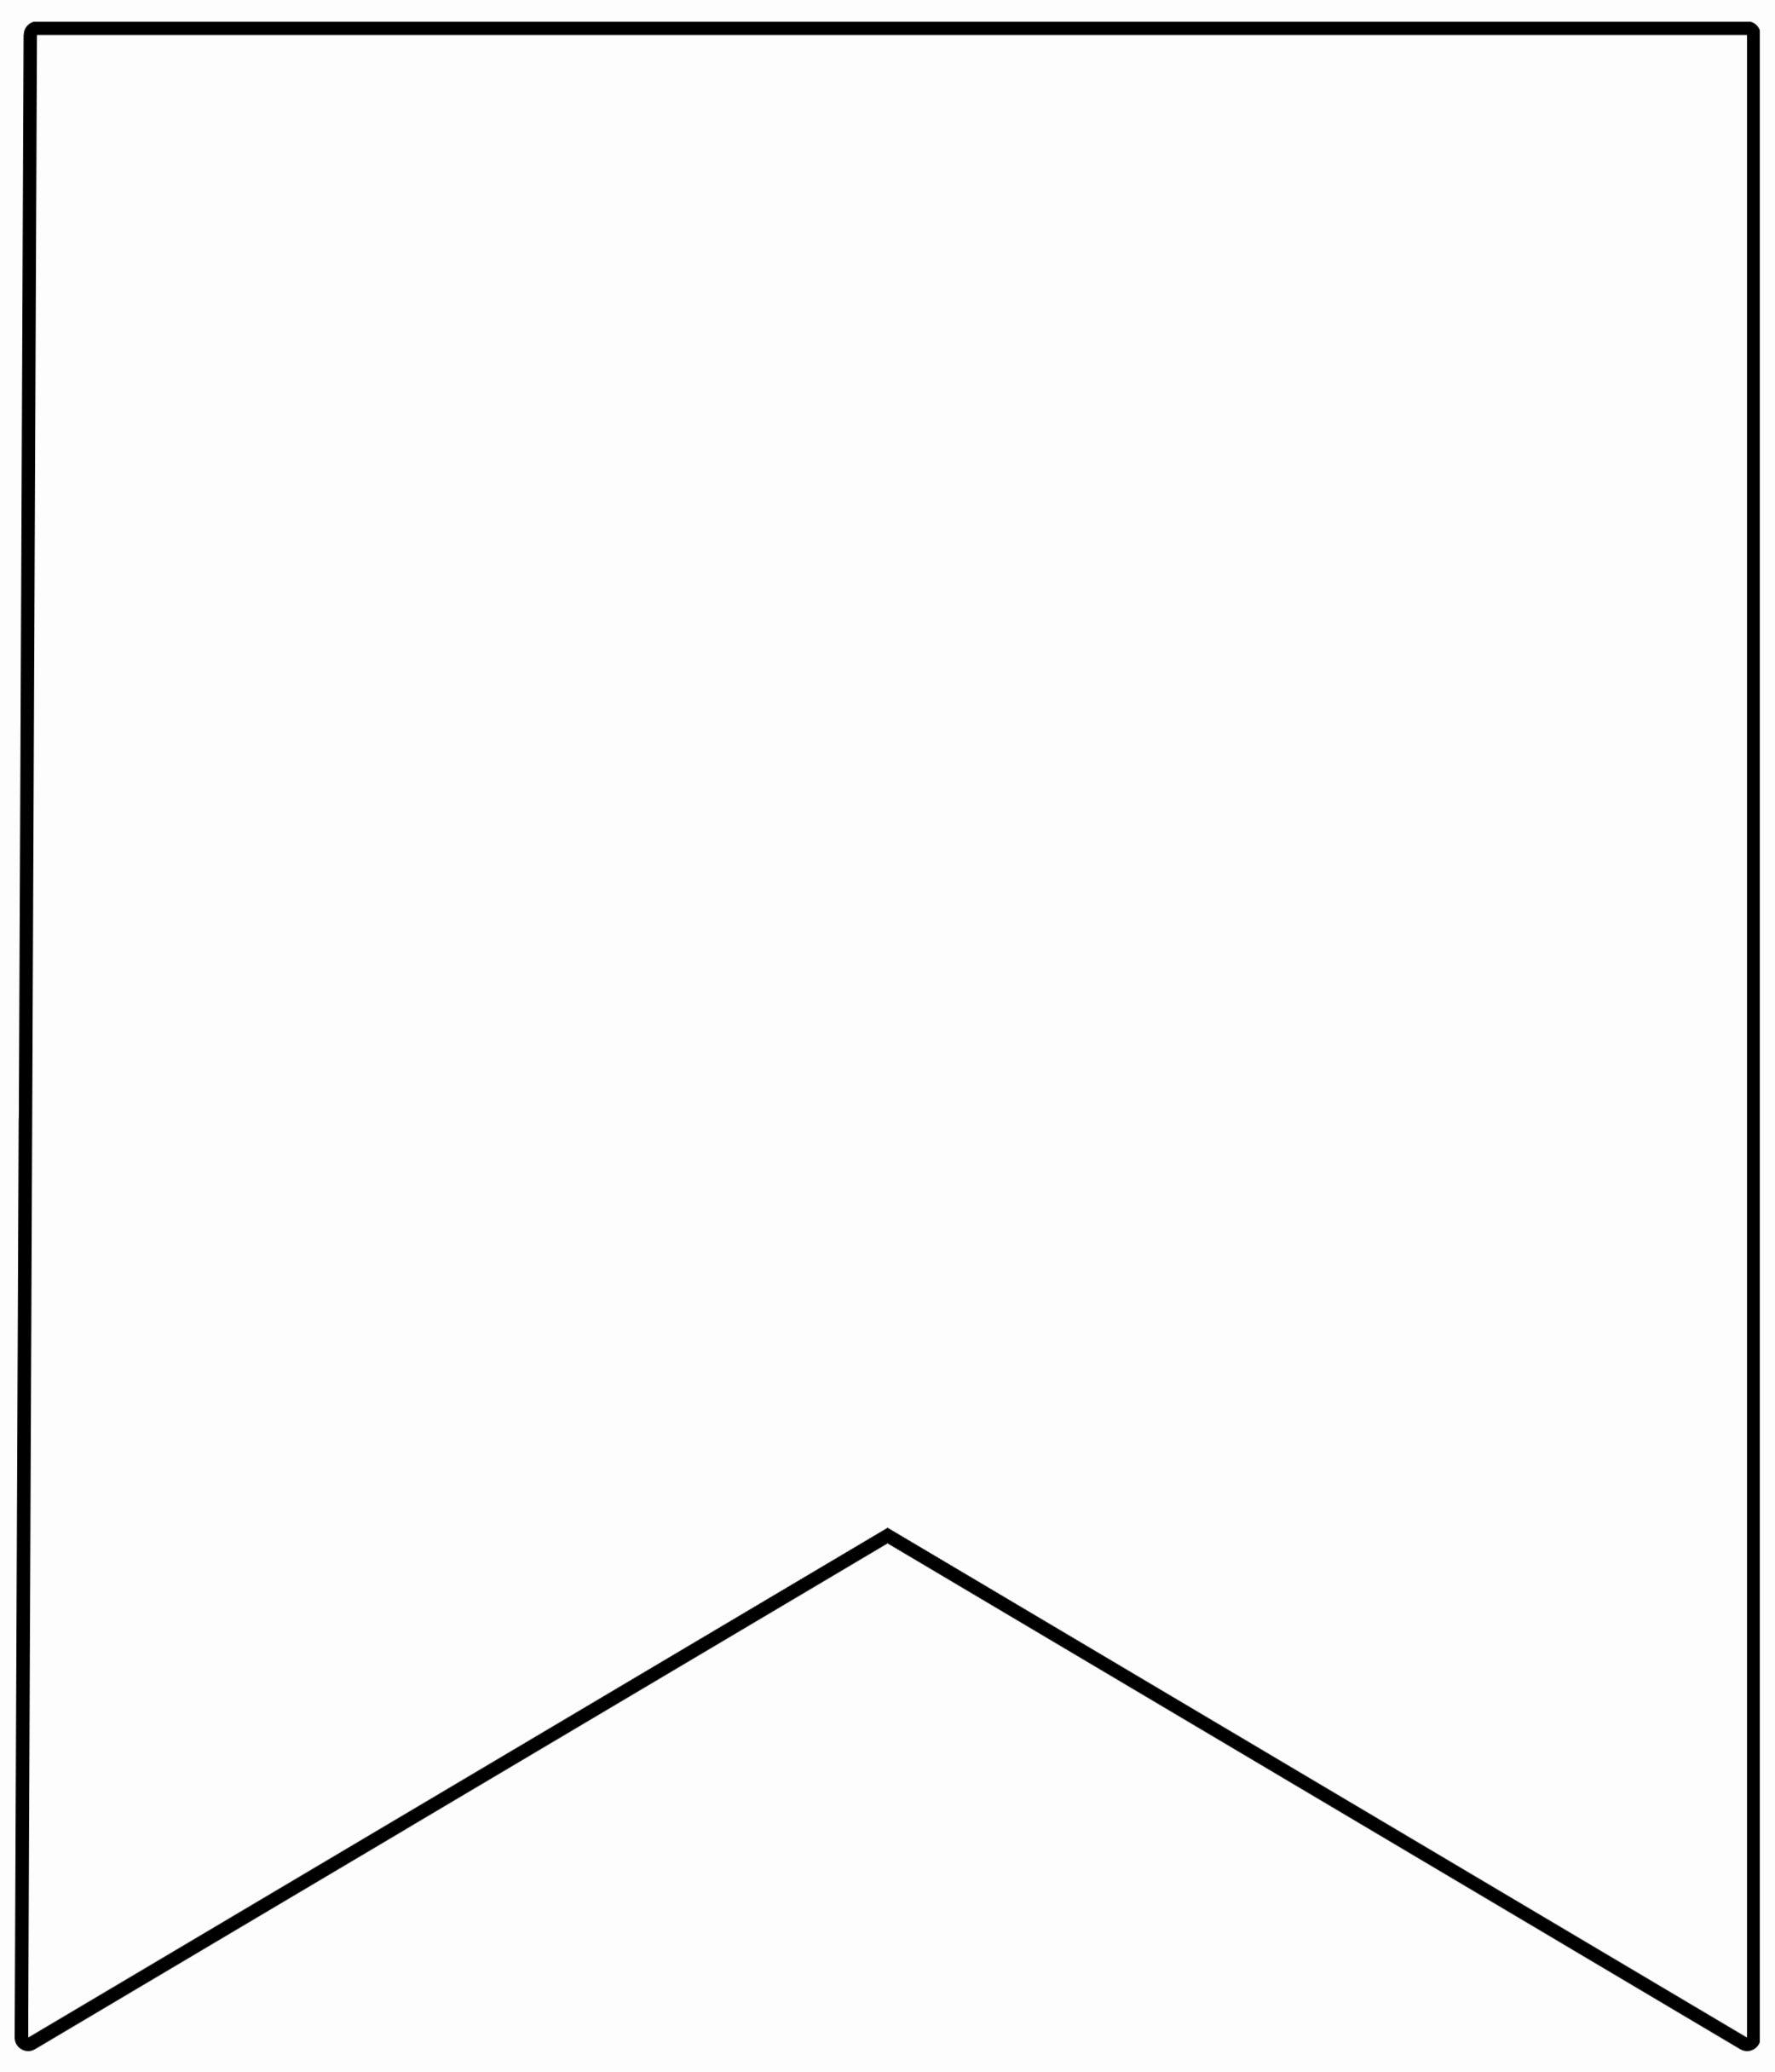 Printable Pennant Banner Template Elegant Free Printable Banner Templates Blank Banners Paper